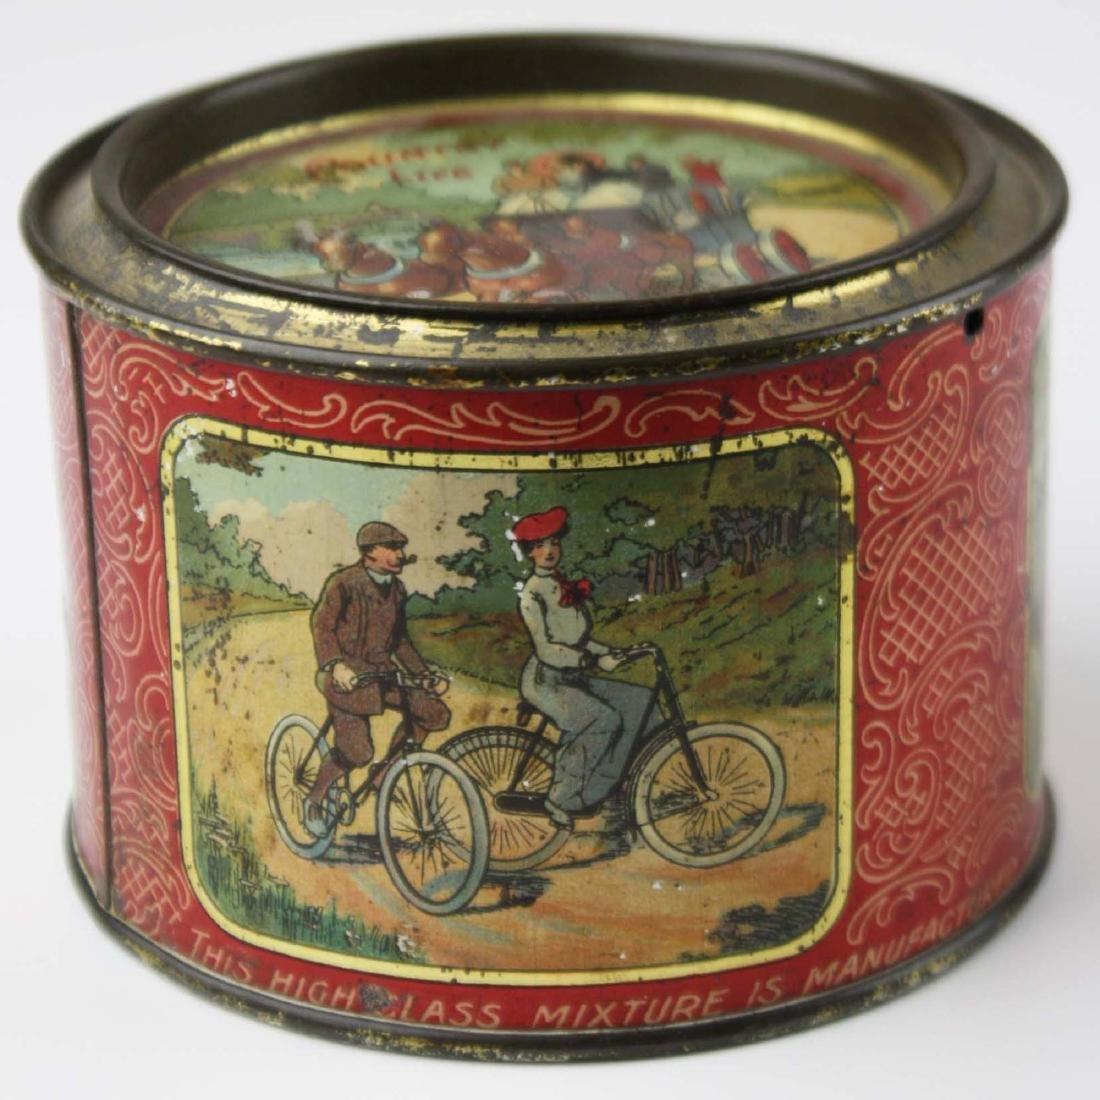 Country Life round tobacco tin